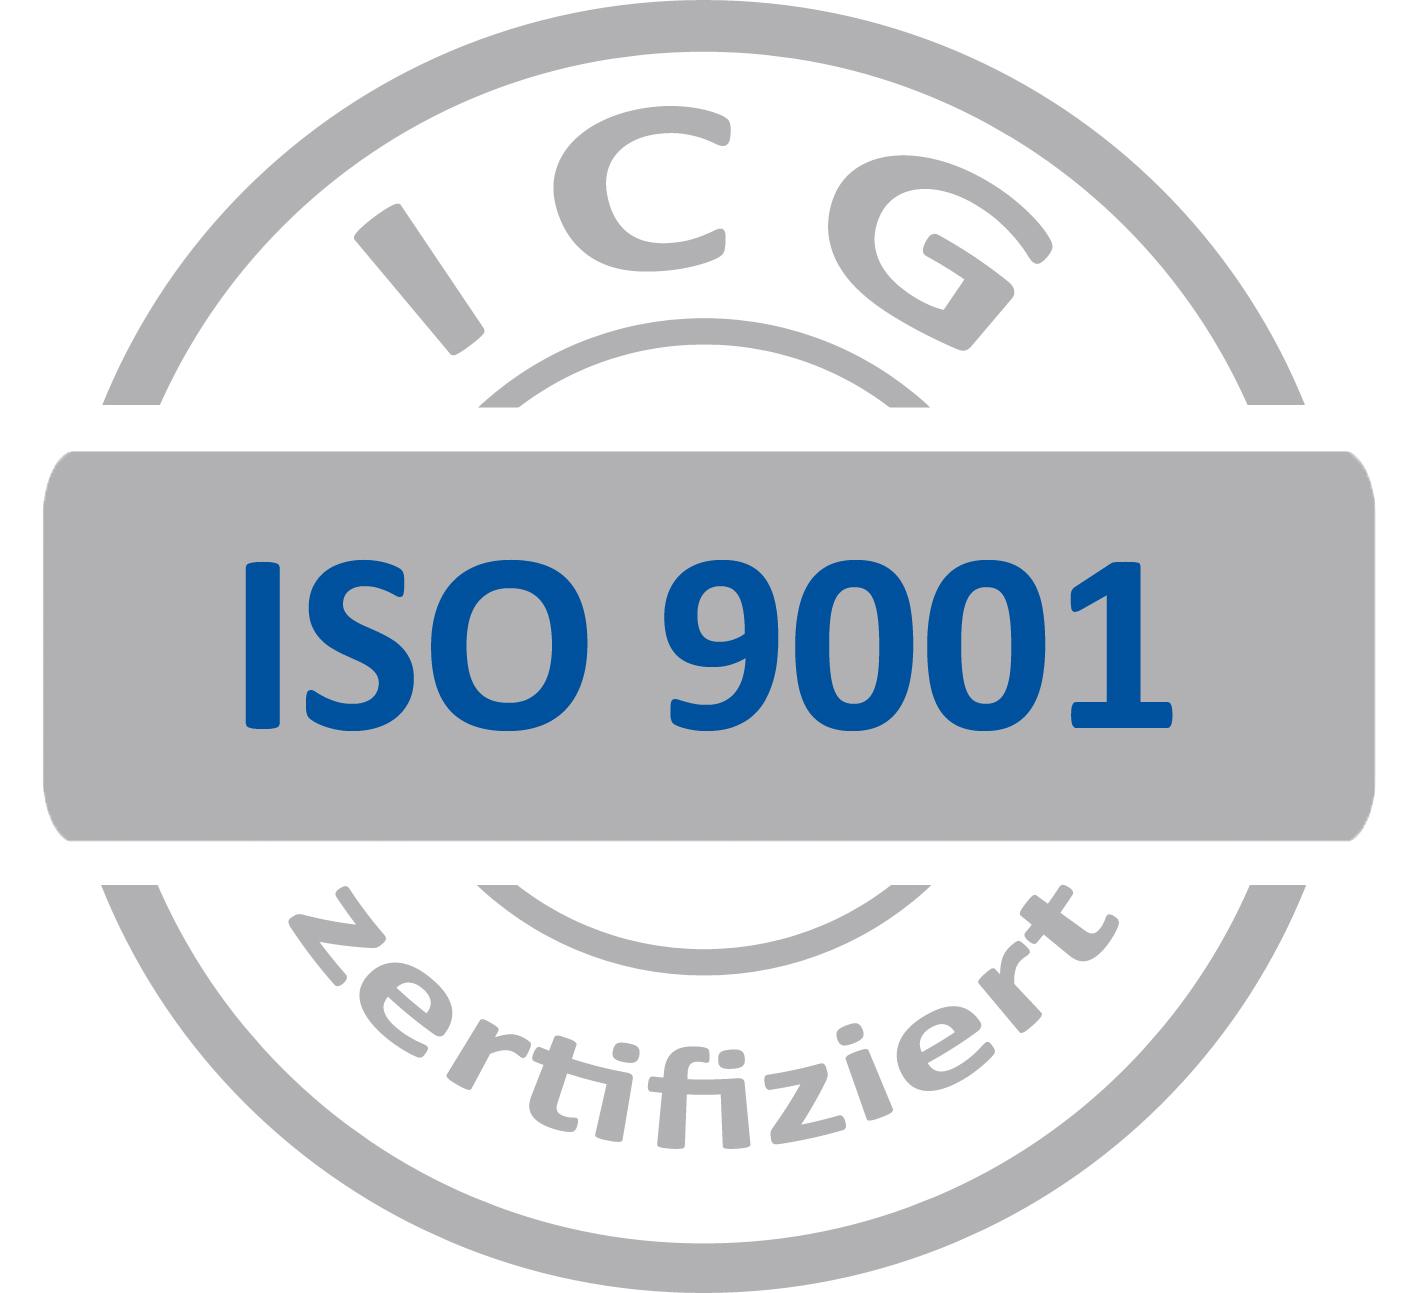 Zertifiziert nach ISO 9001:2015